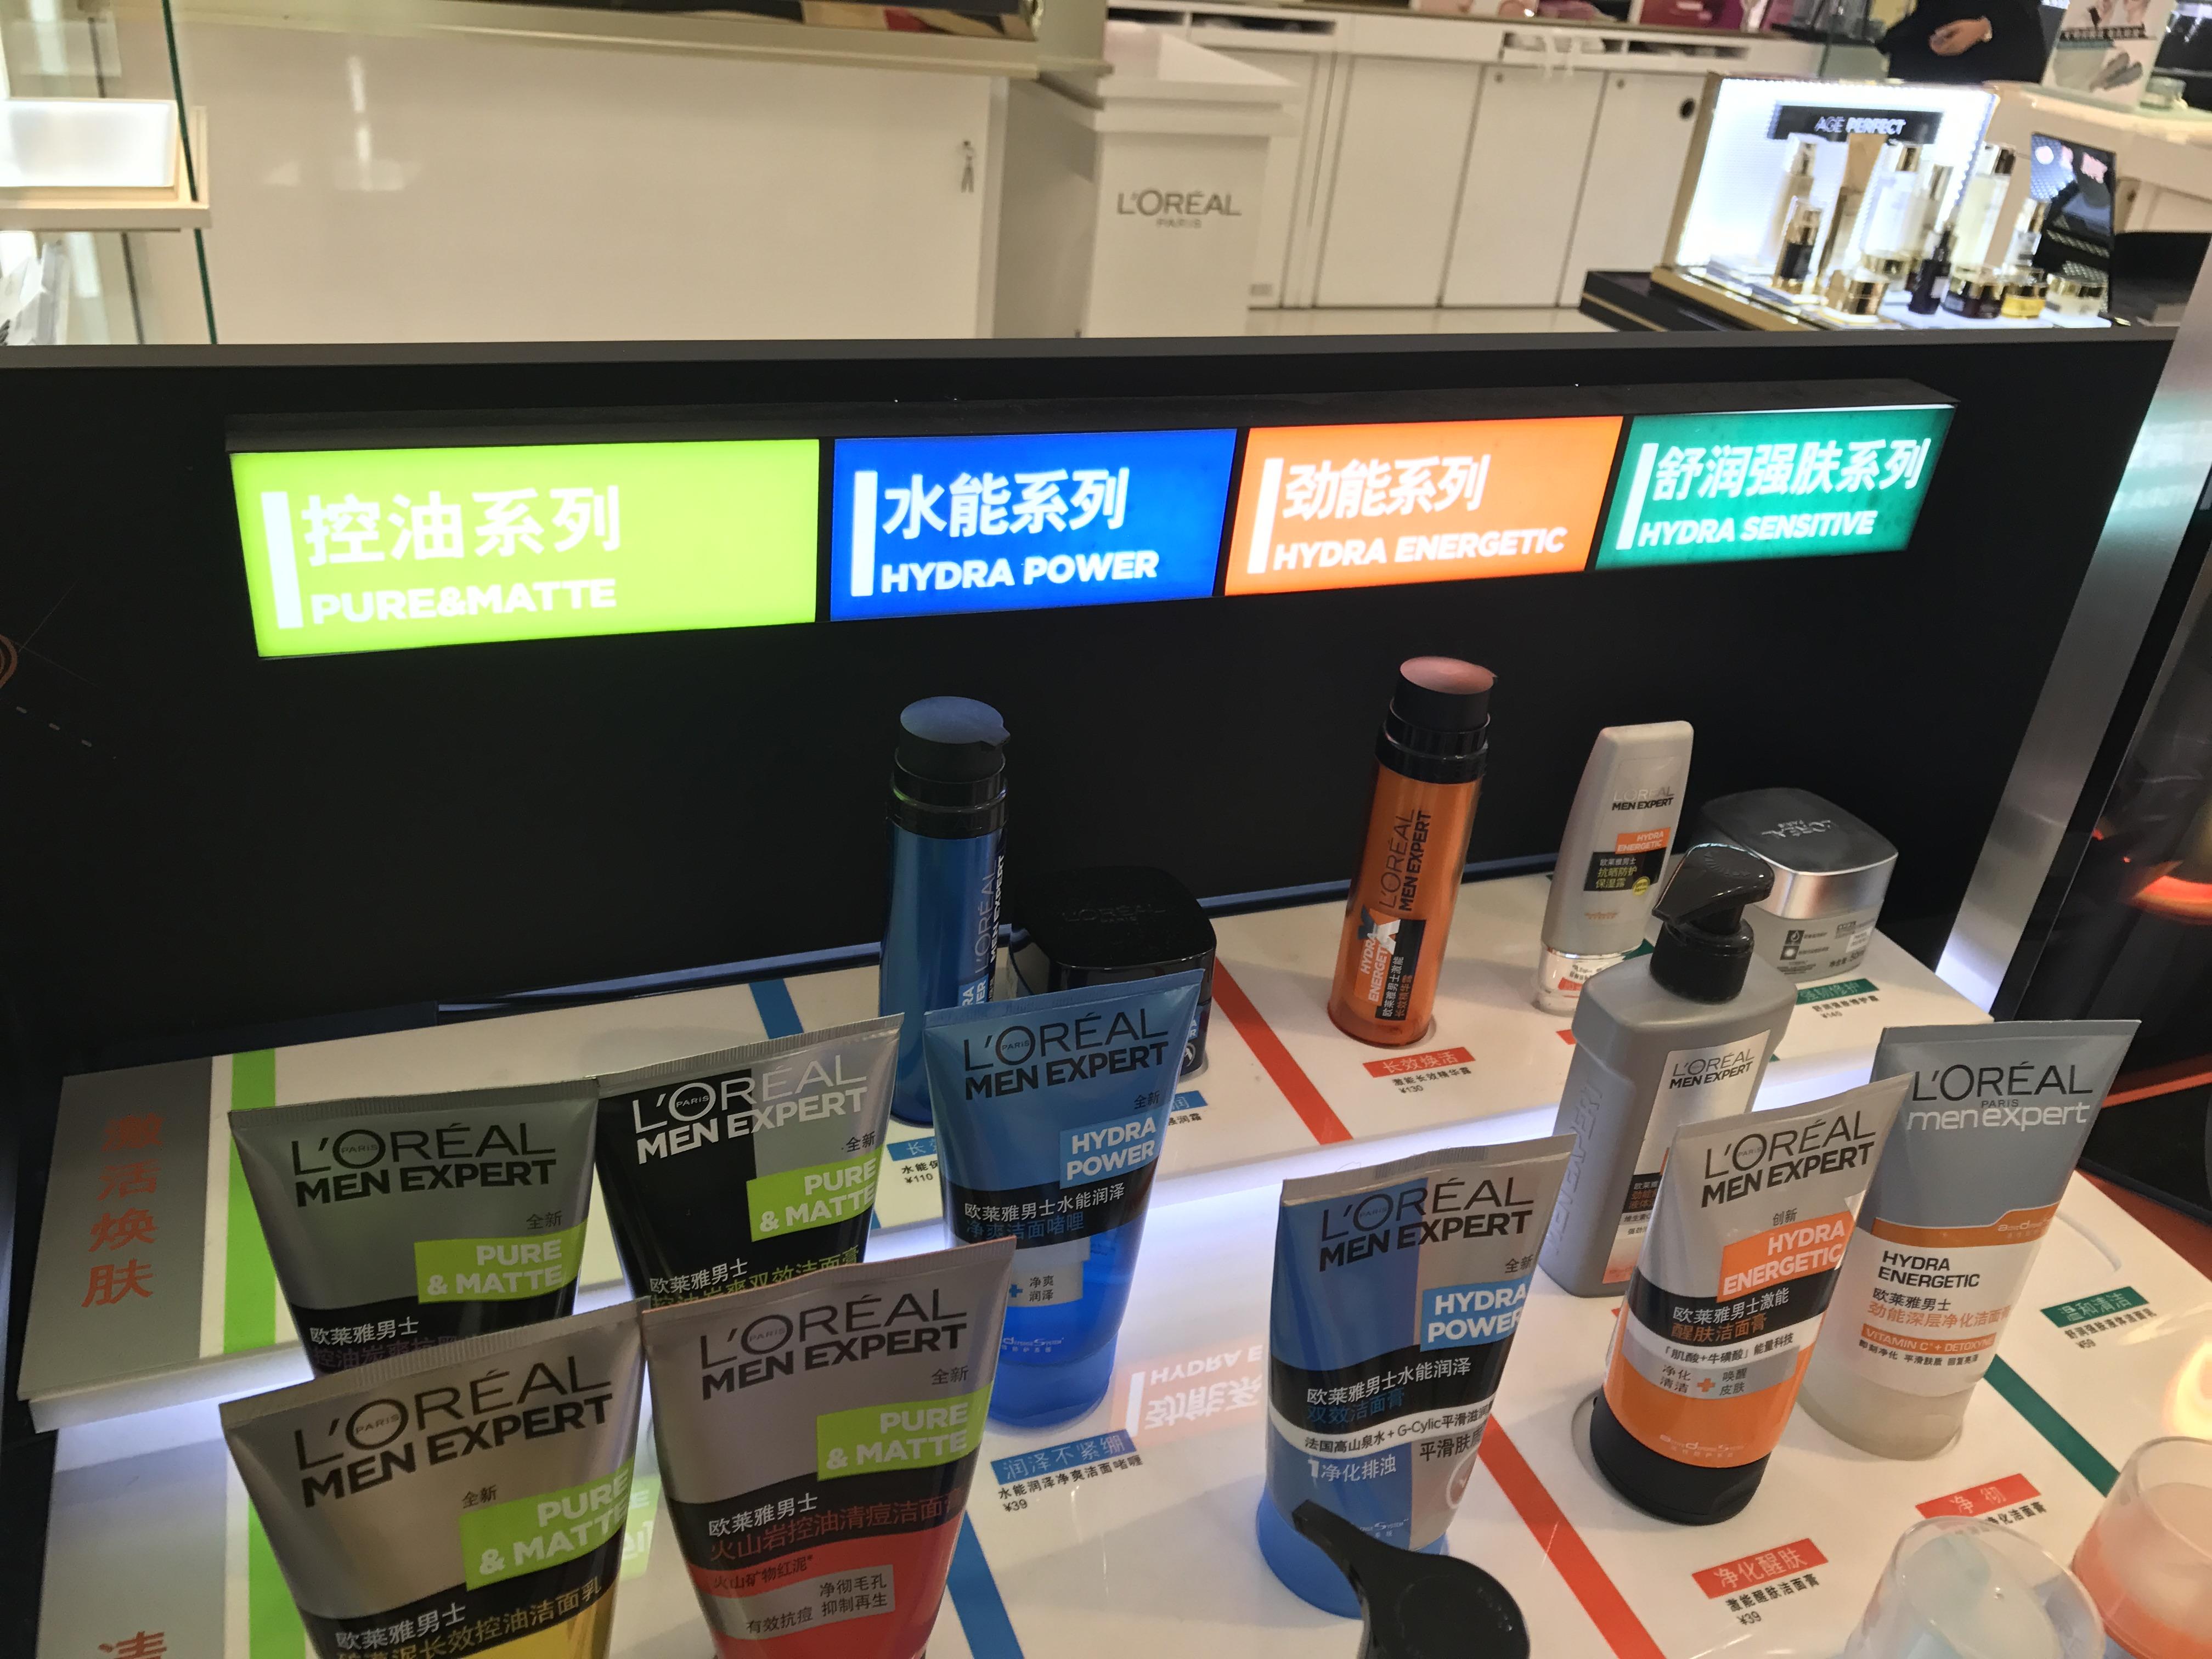 8.8 inch pos display